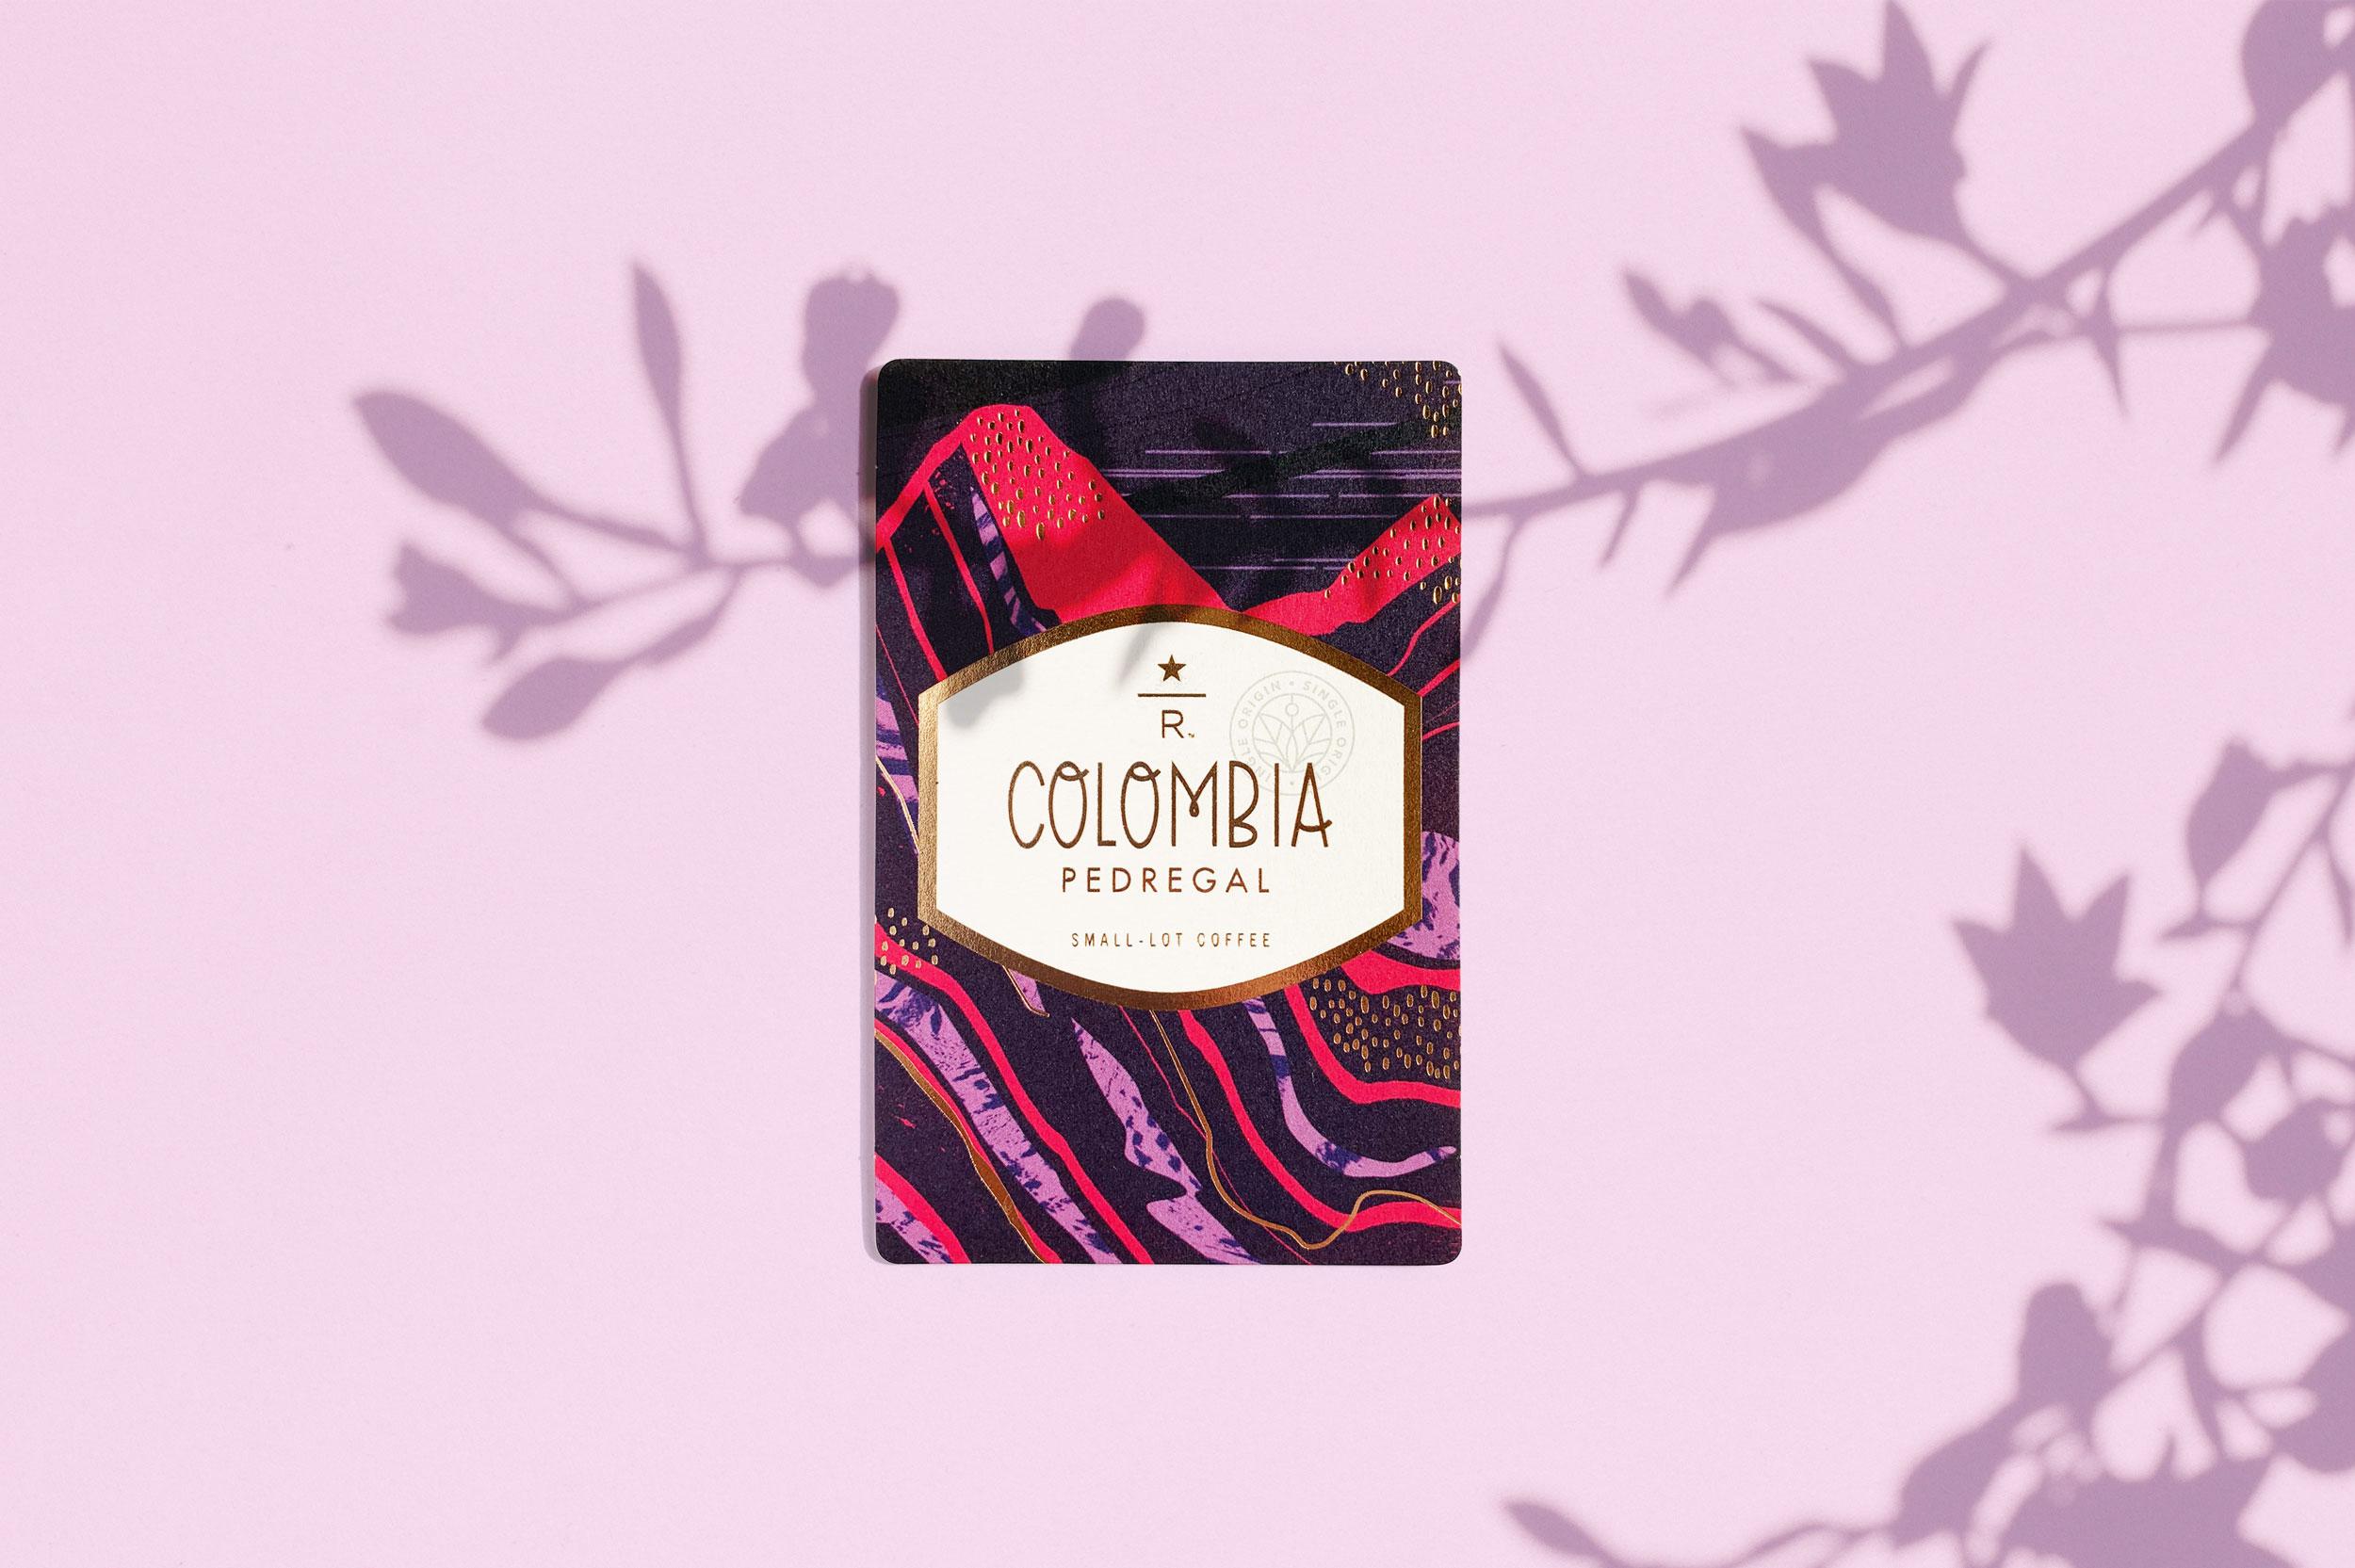 colombiaPedregal-rsvCard.jpg